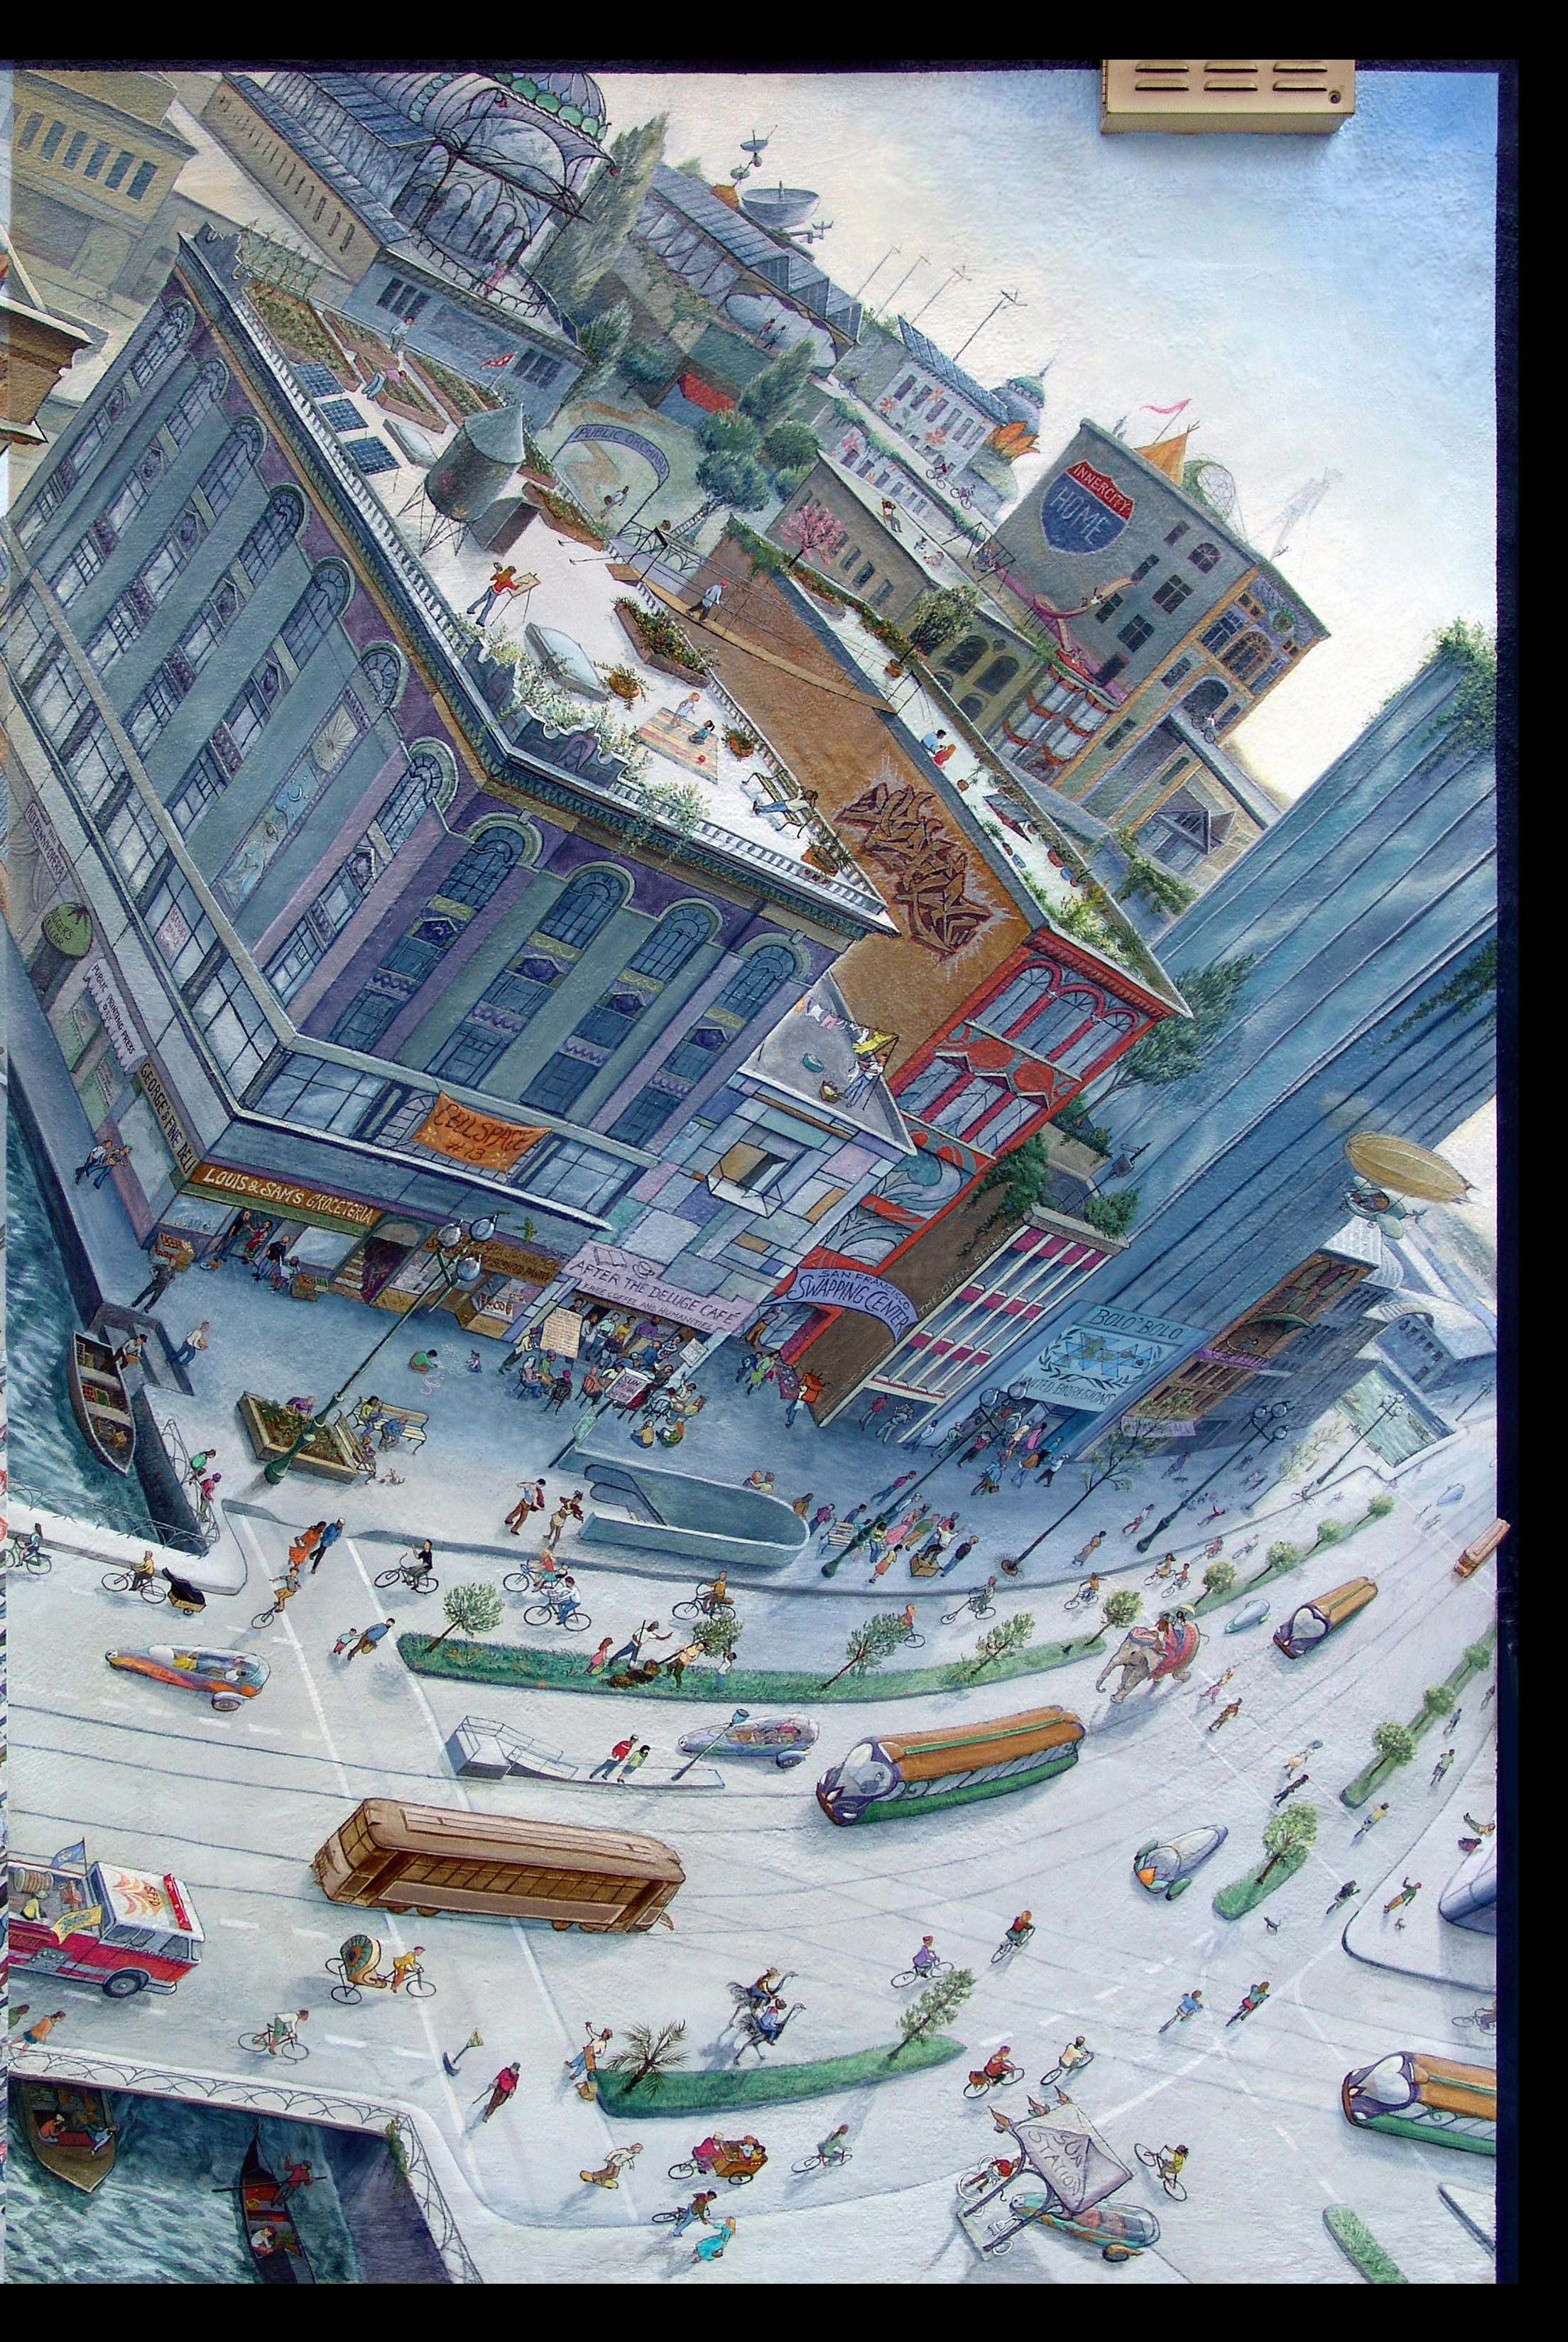 Future Market Street Railway Mural by Mona Caron